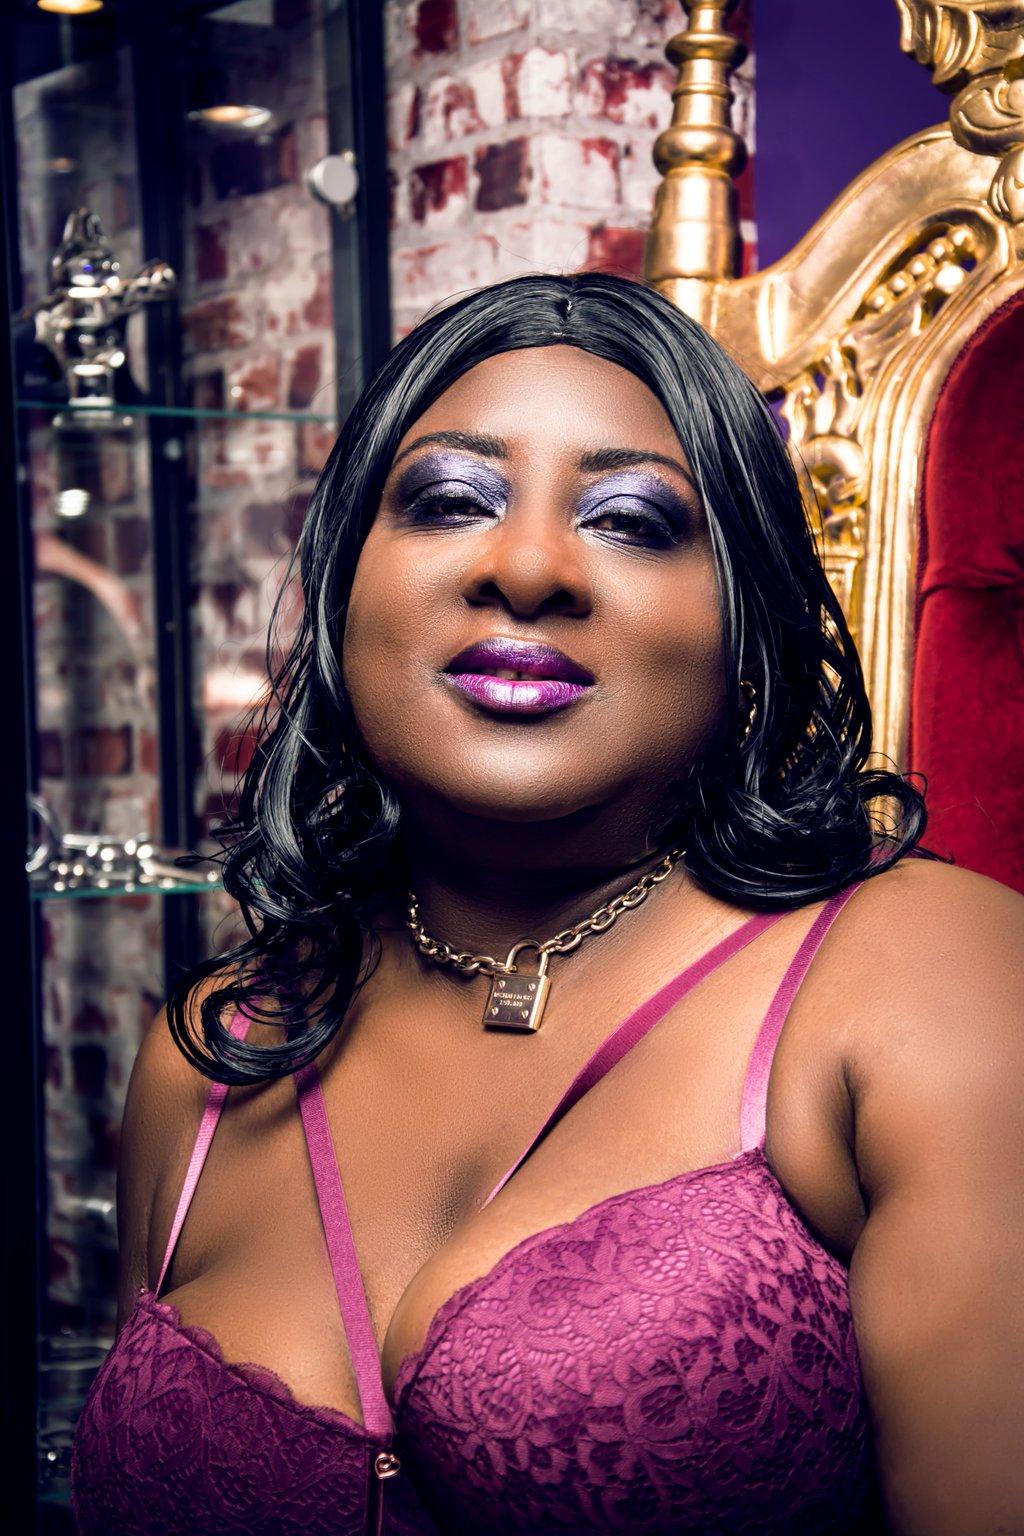 Black Dominatrix Mistress in London